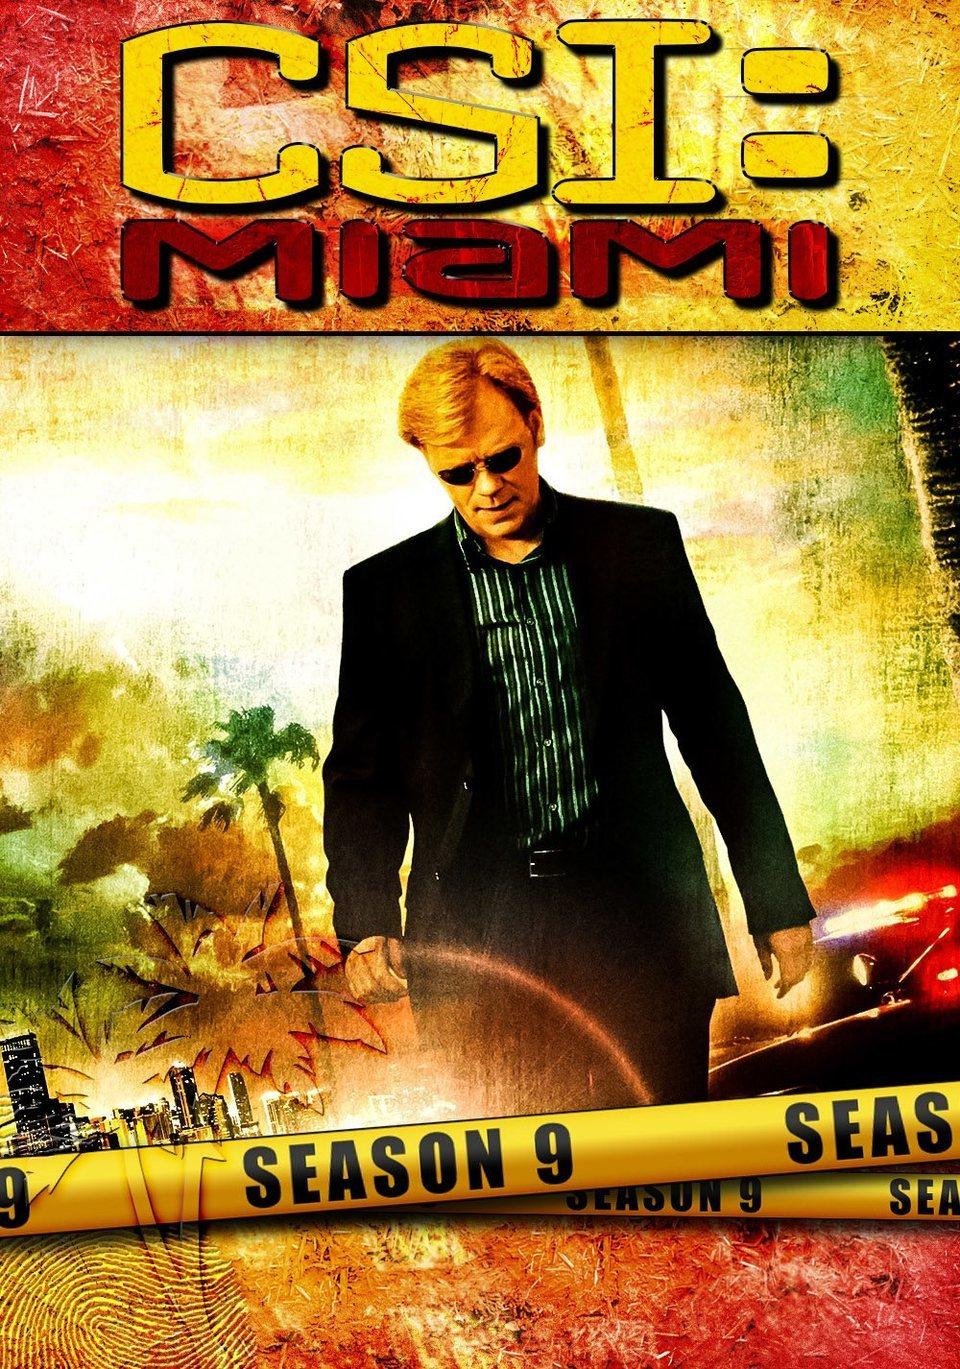 Cartel Temporada 9 de 'CSI: Miami'